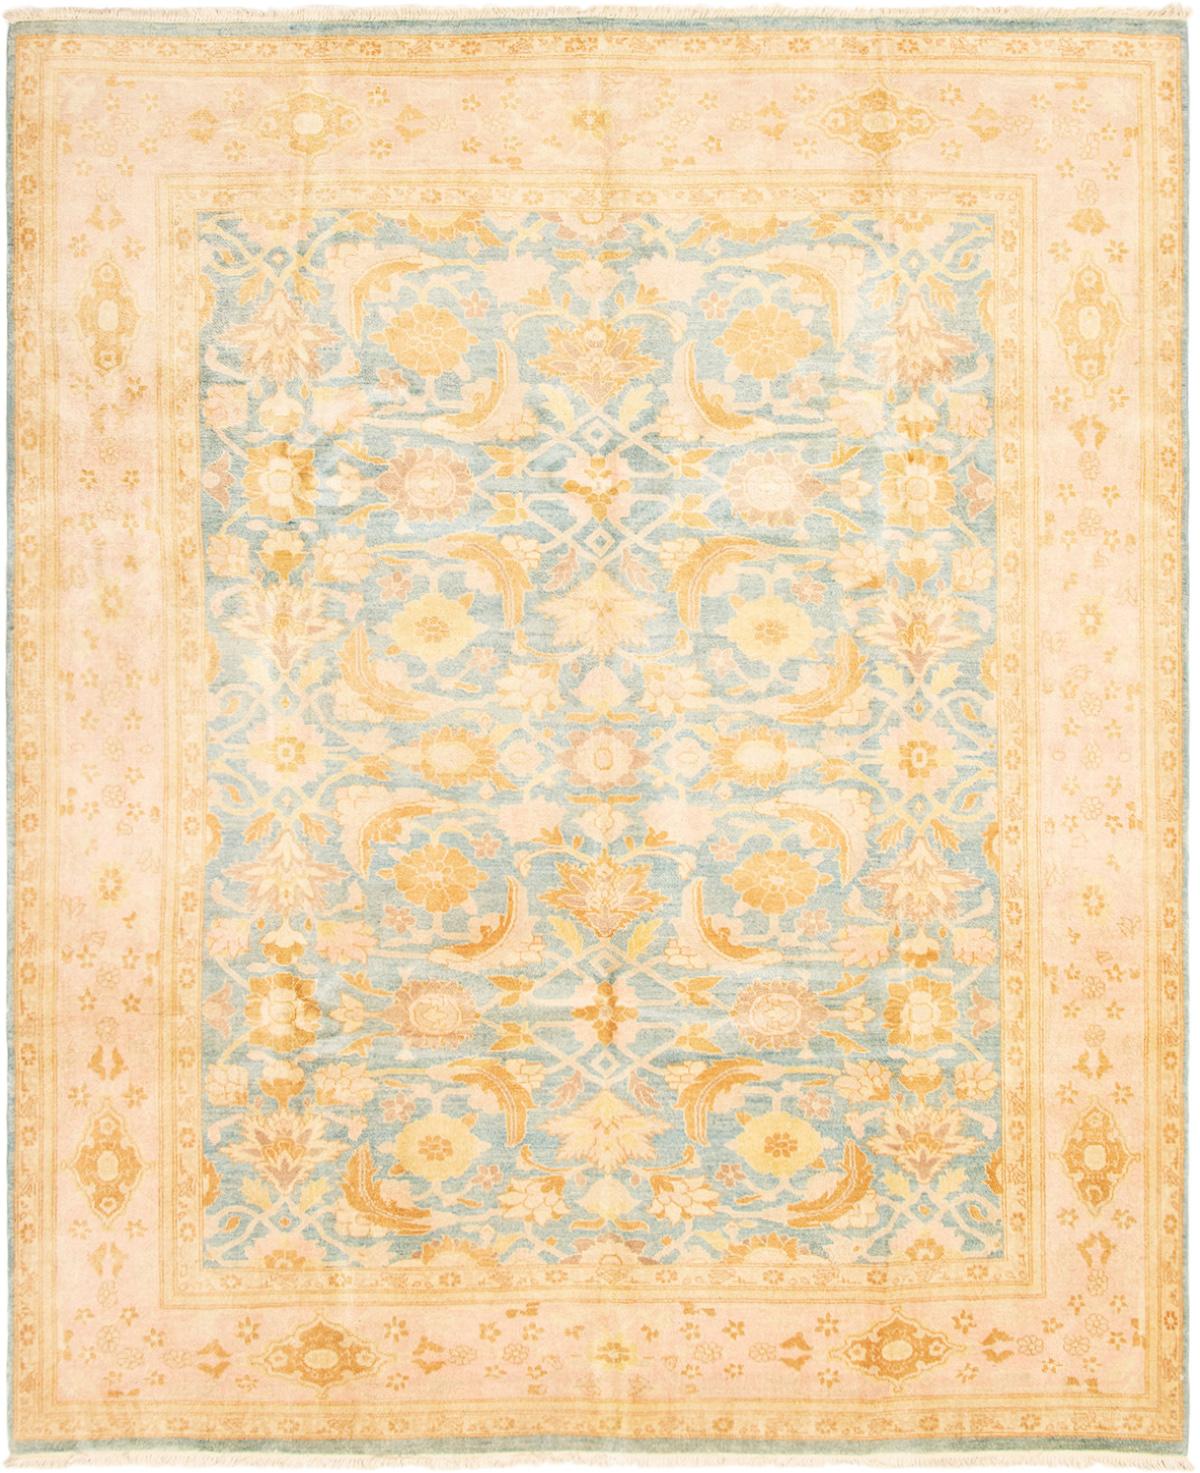 "Hand-knotted Peshawar Oushak Blue Wool Rug 8'3"" x 9'10"" Size: 8'3"" x 9'10"""